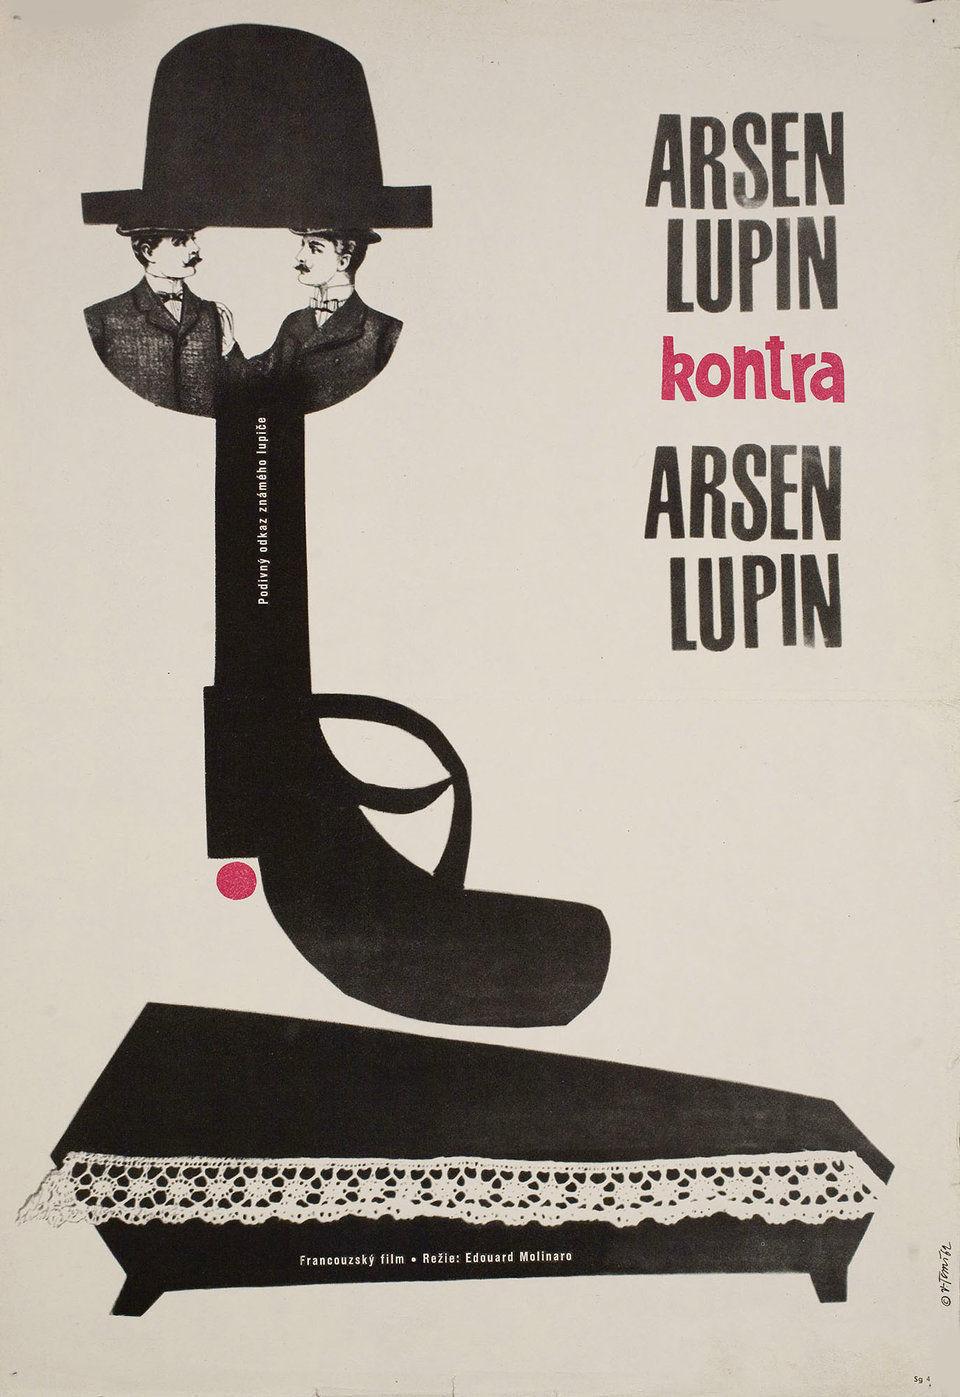 arsene-lupin-contre-arsene-lupin-1962-original-czech-movie-poster